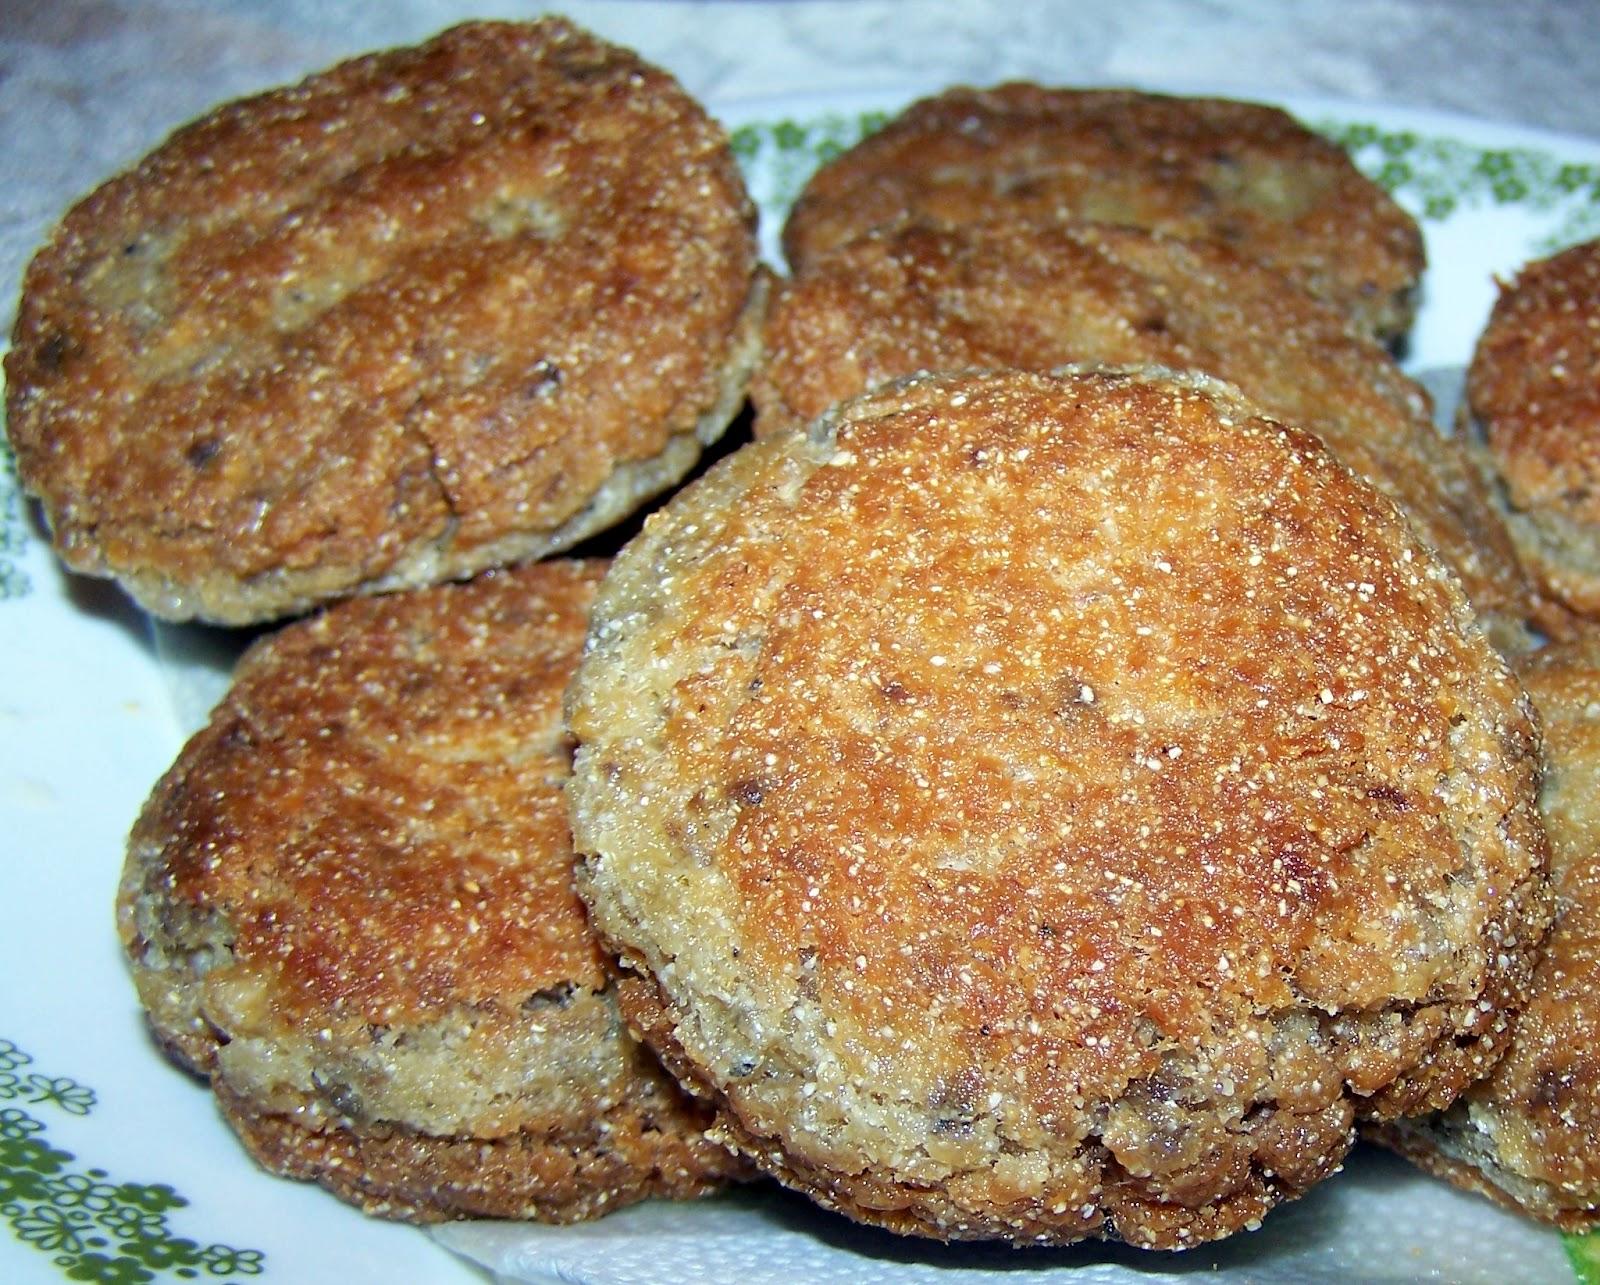 Man That Stuff Is Good!: Fried Salmon Patties